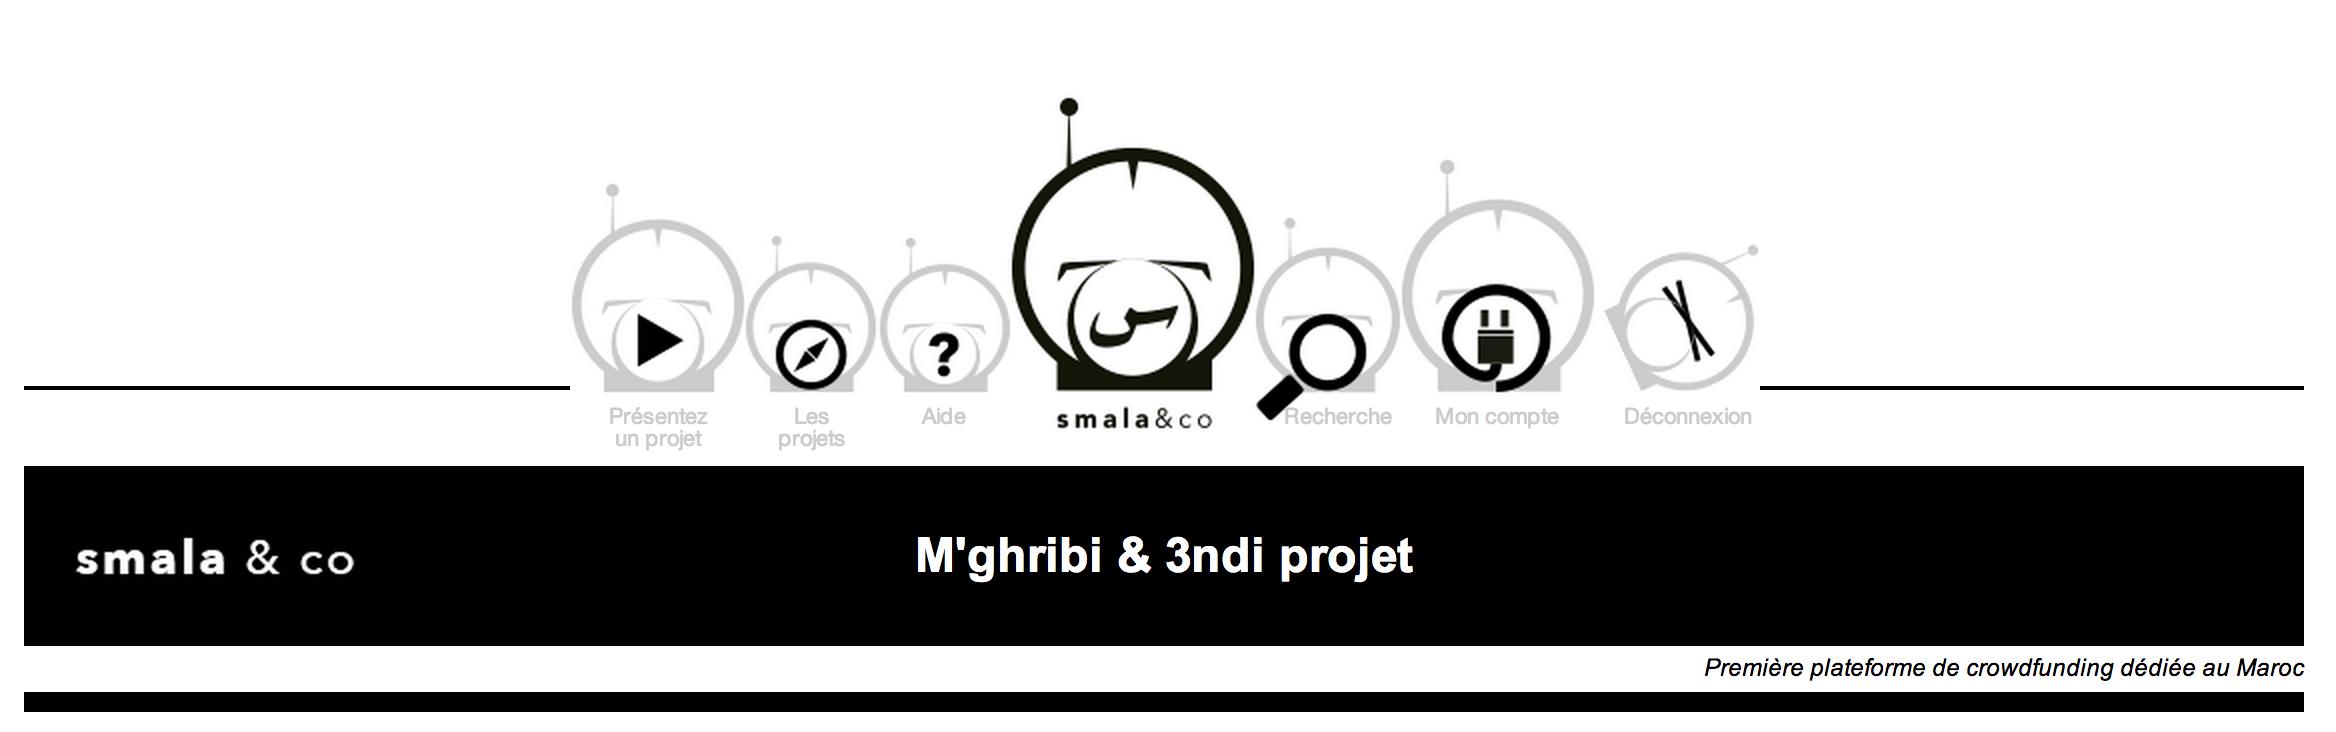 1ère plateforme de crowdfunding spéciale Maghreb